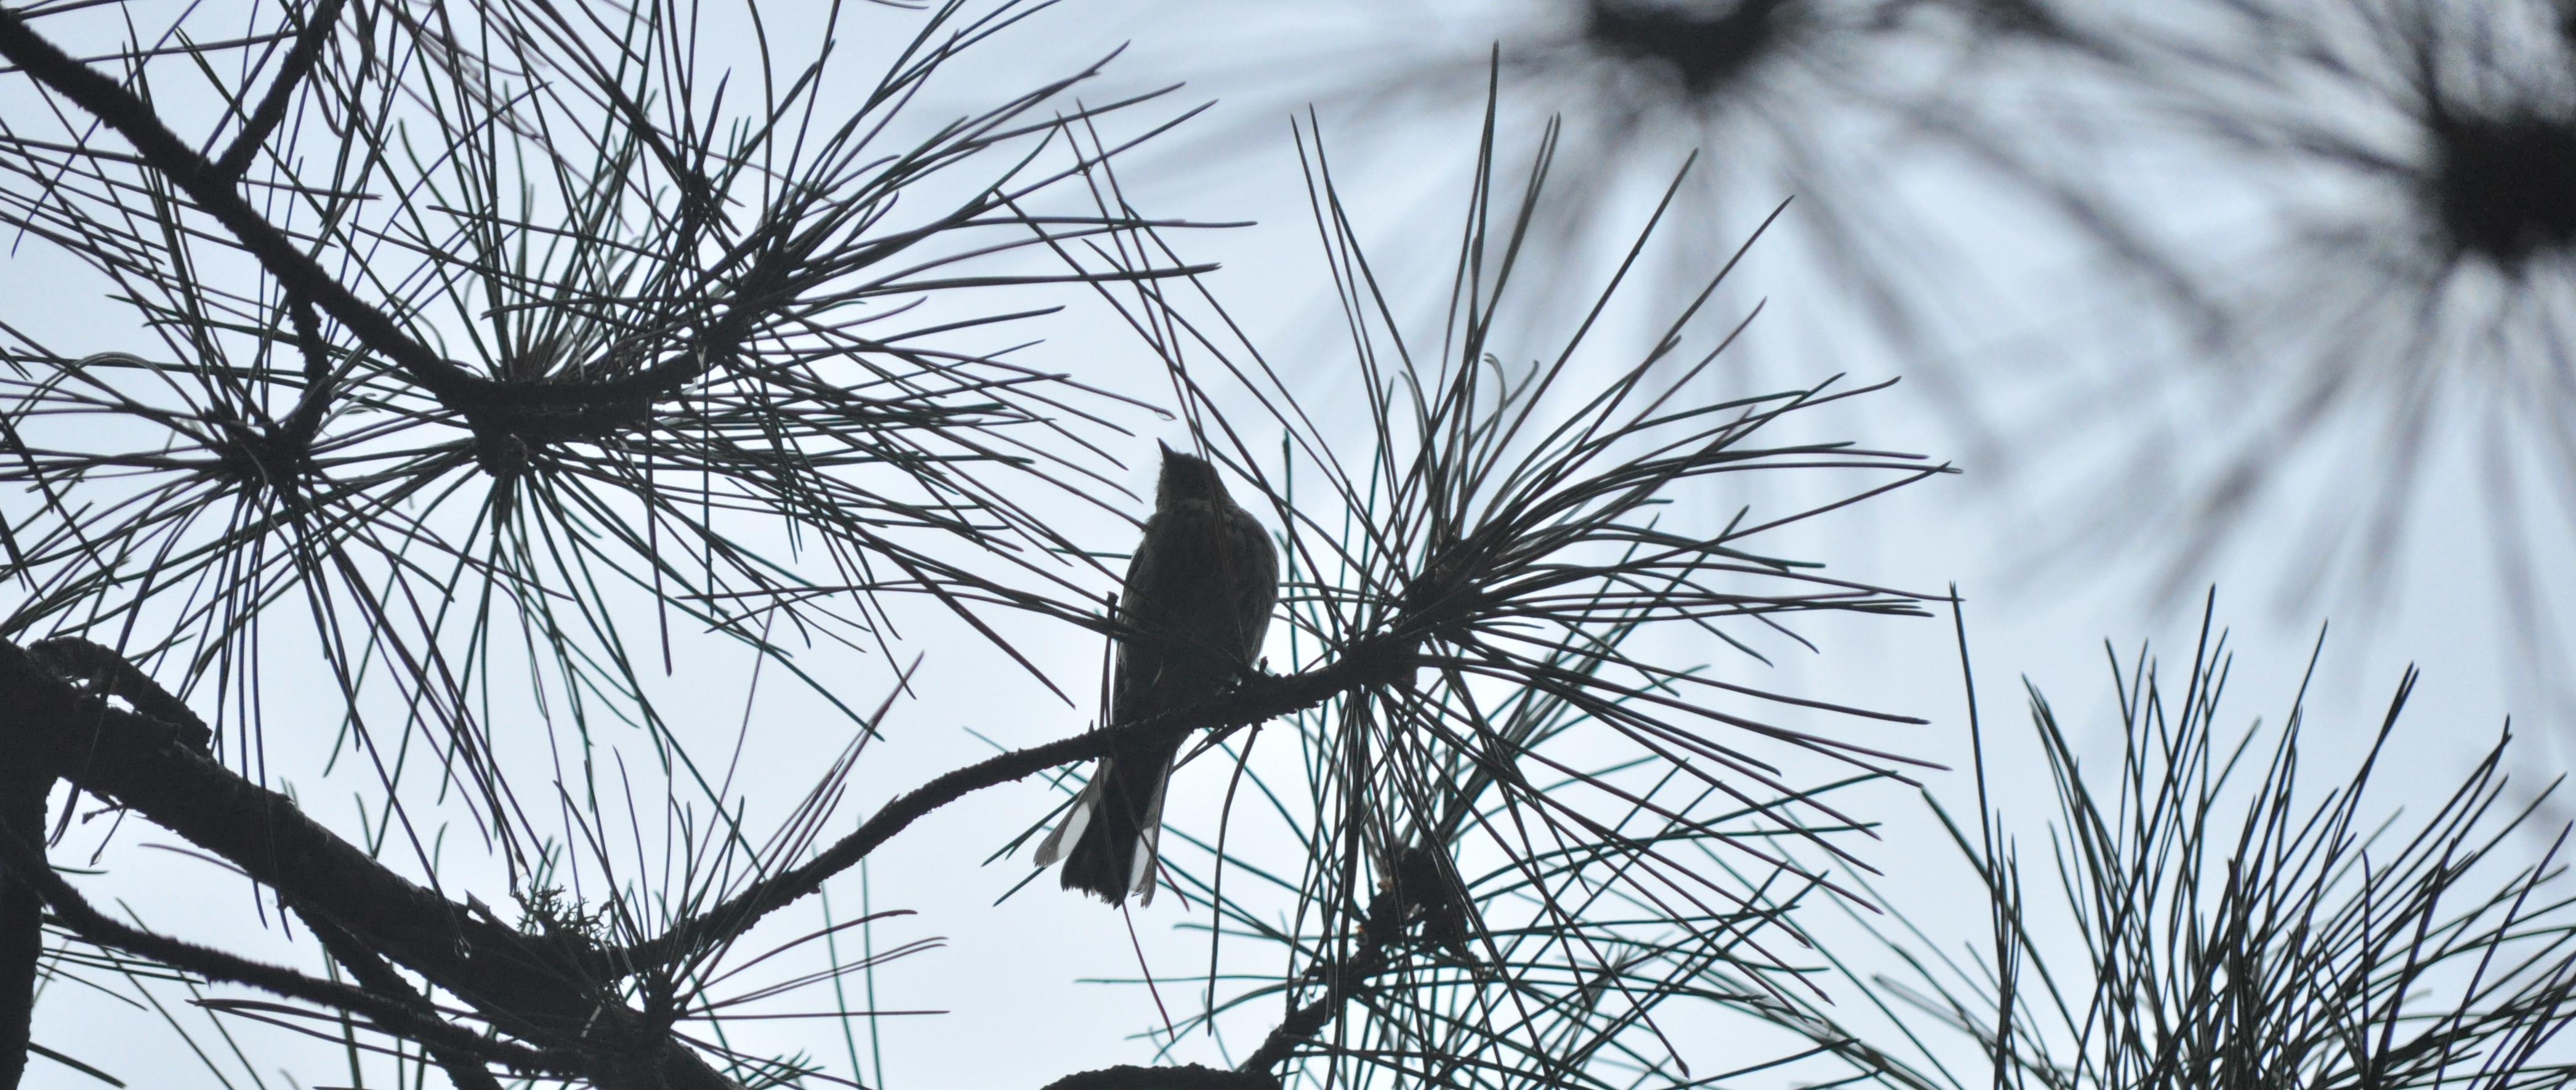 2015-09-07_upnorth-bird